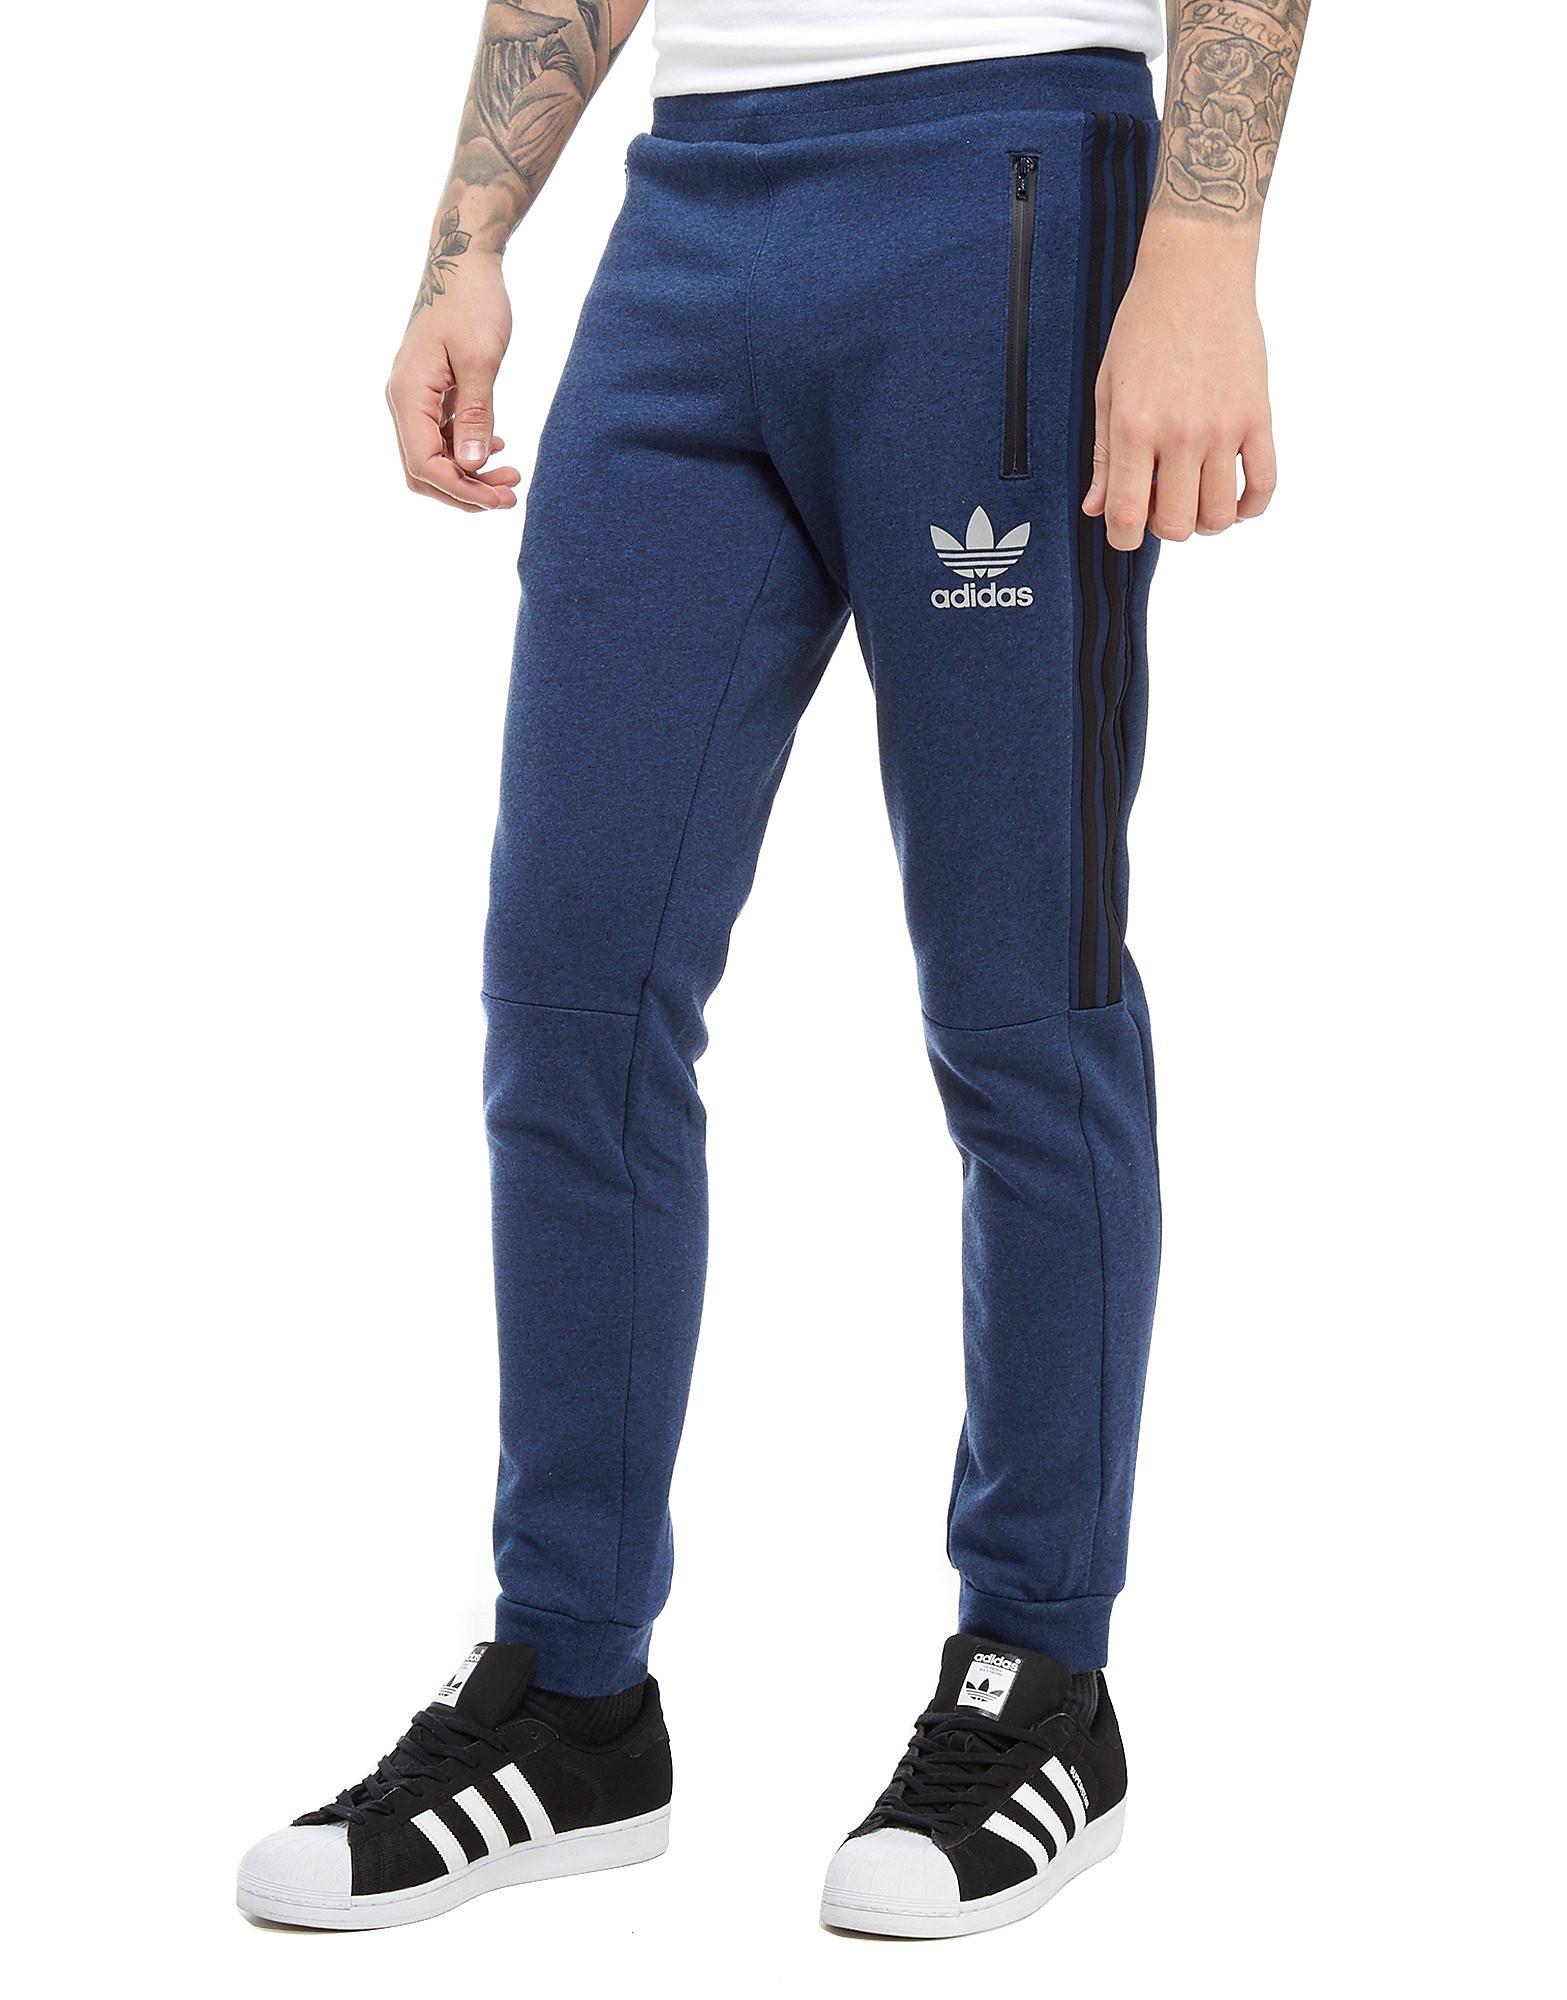 adidas Originals Street Run Pants